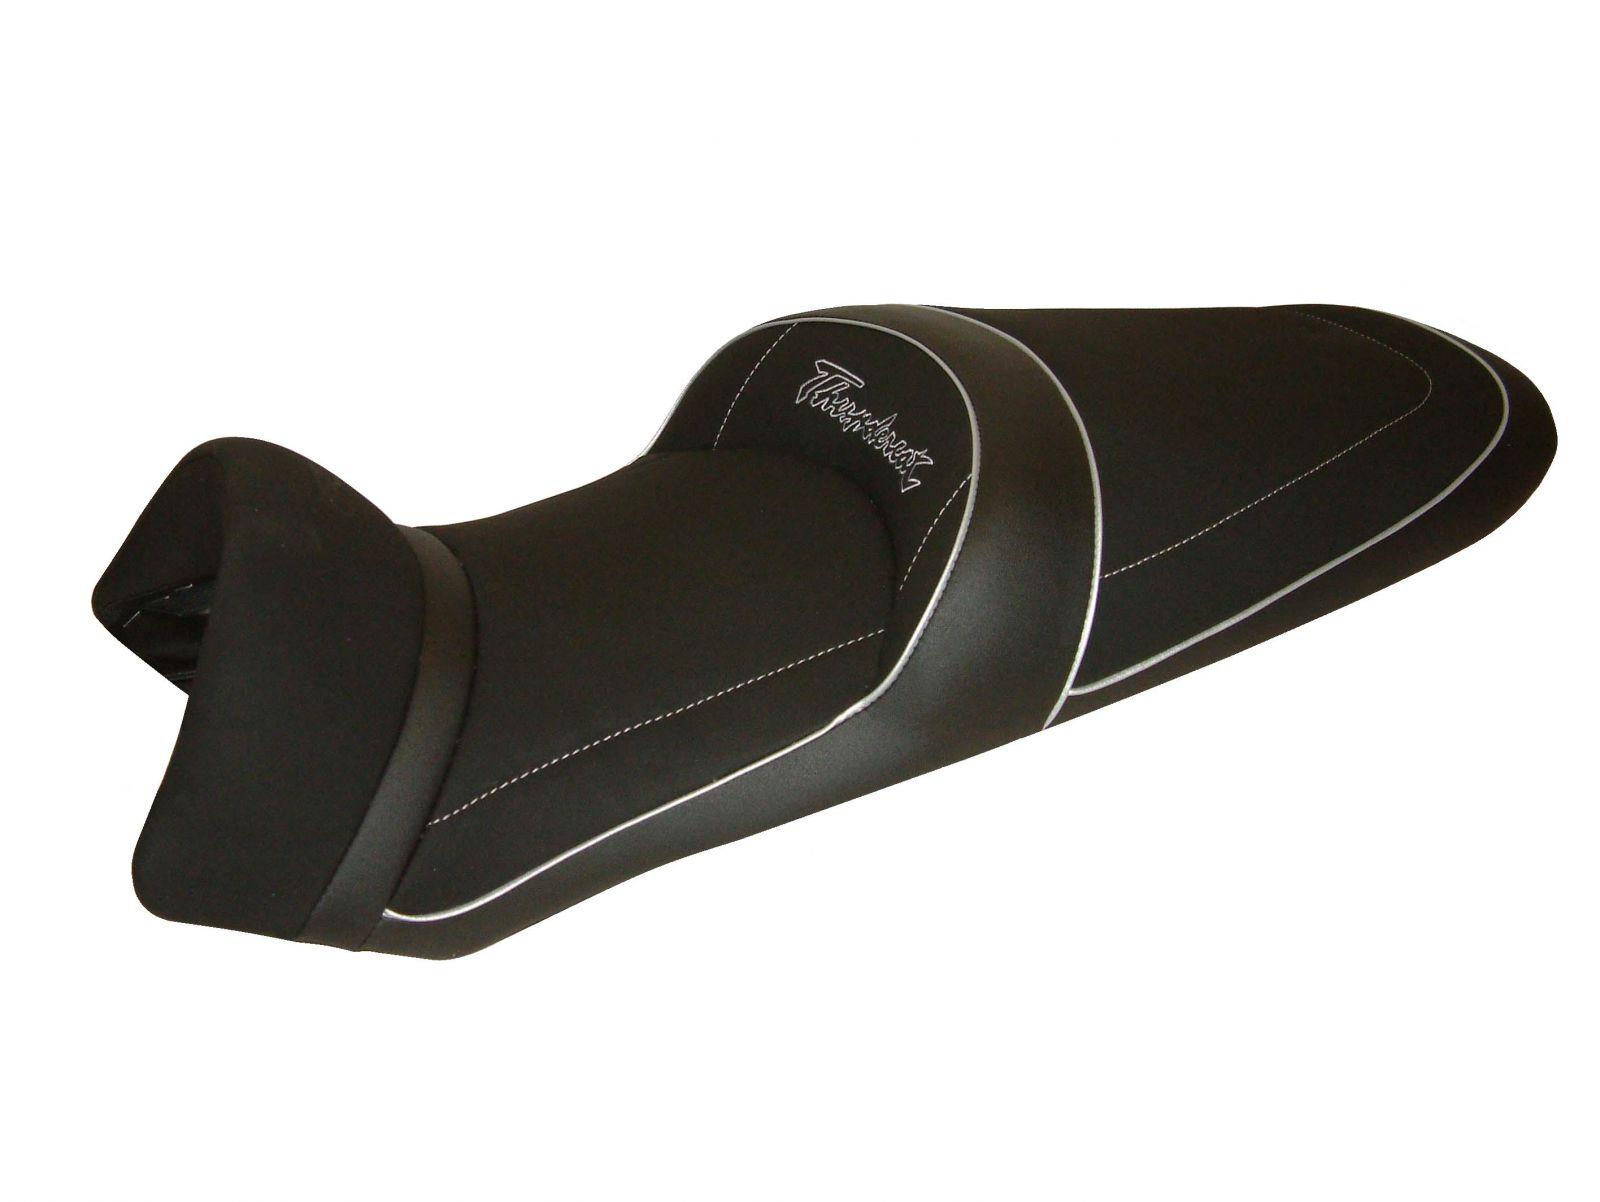 Deluxe seat SGC2883 - YAMAHA YZF 600 R THUNDERCAT [1996-2005]